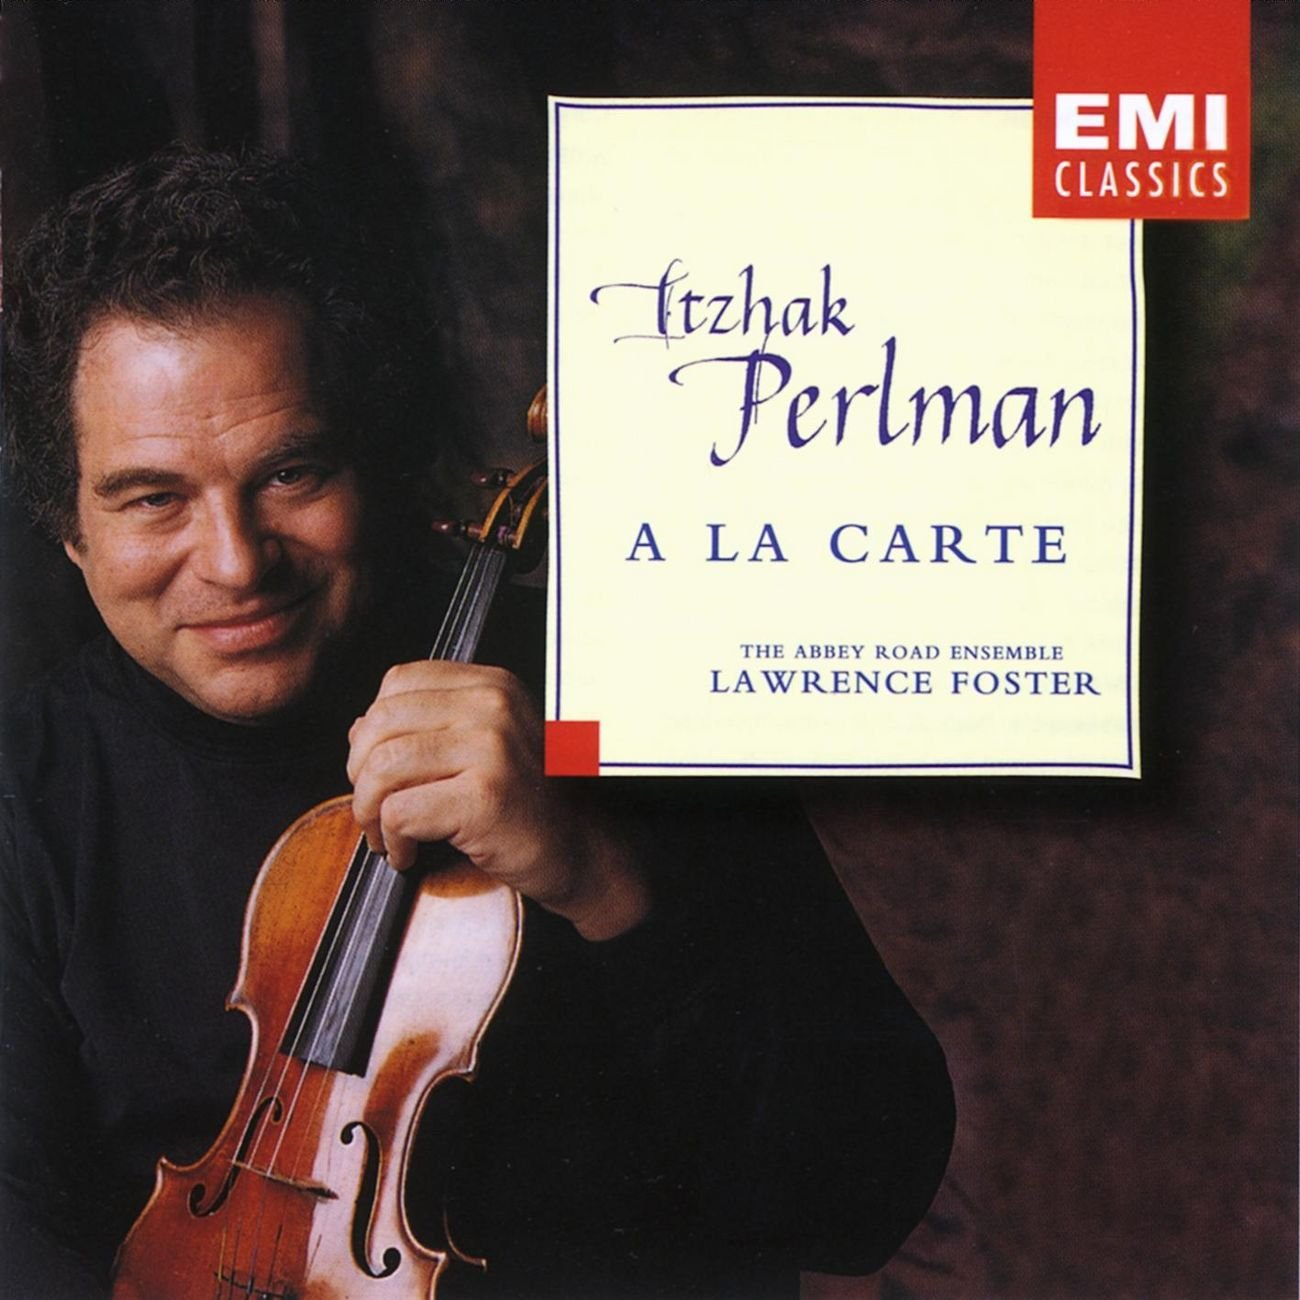 free shipping Itzhak Perlman - A Foster Max 86% OFF Lawrence carte la